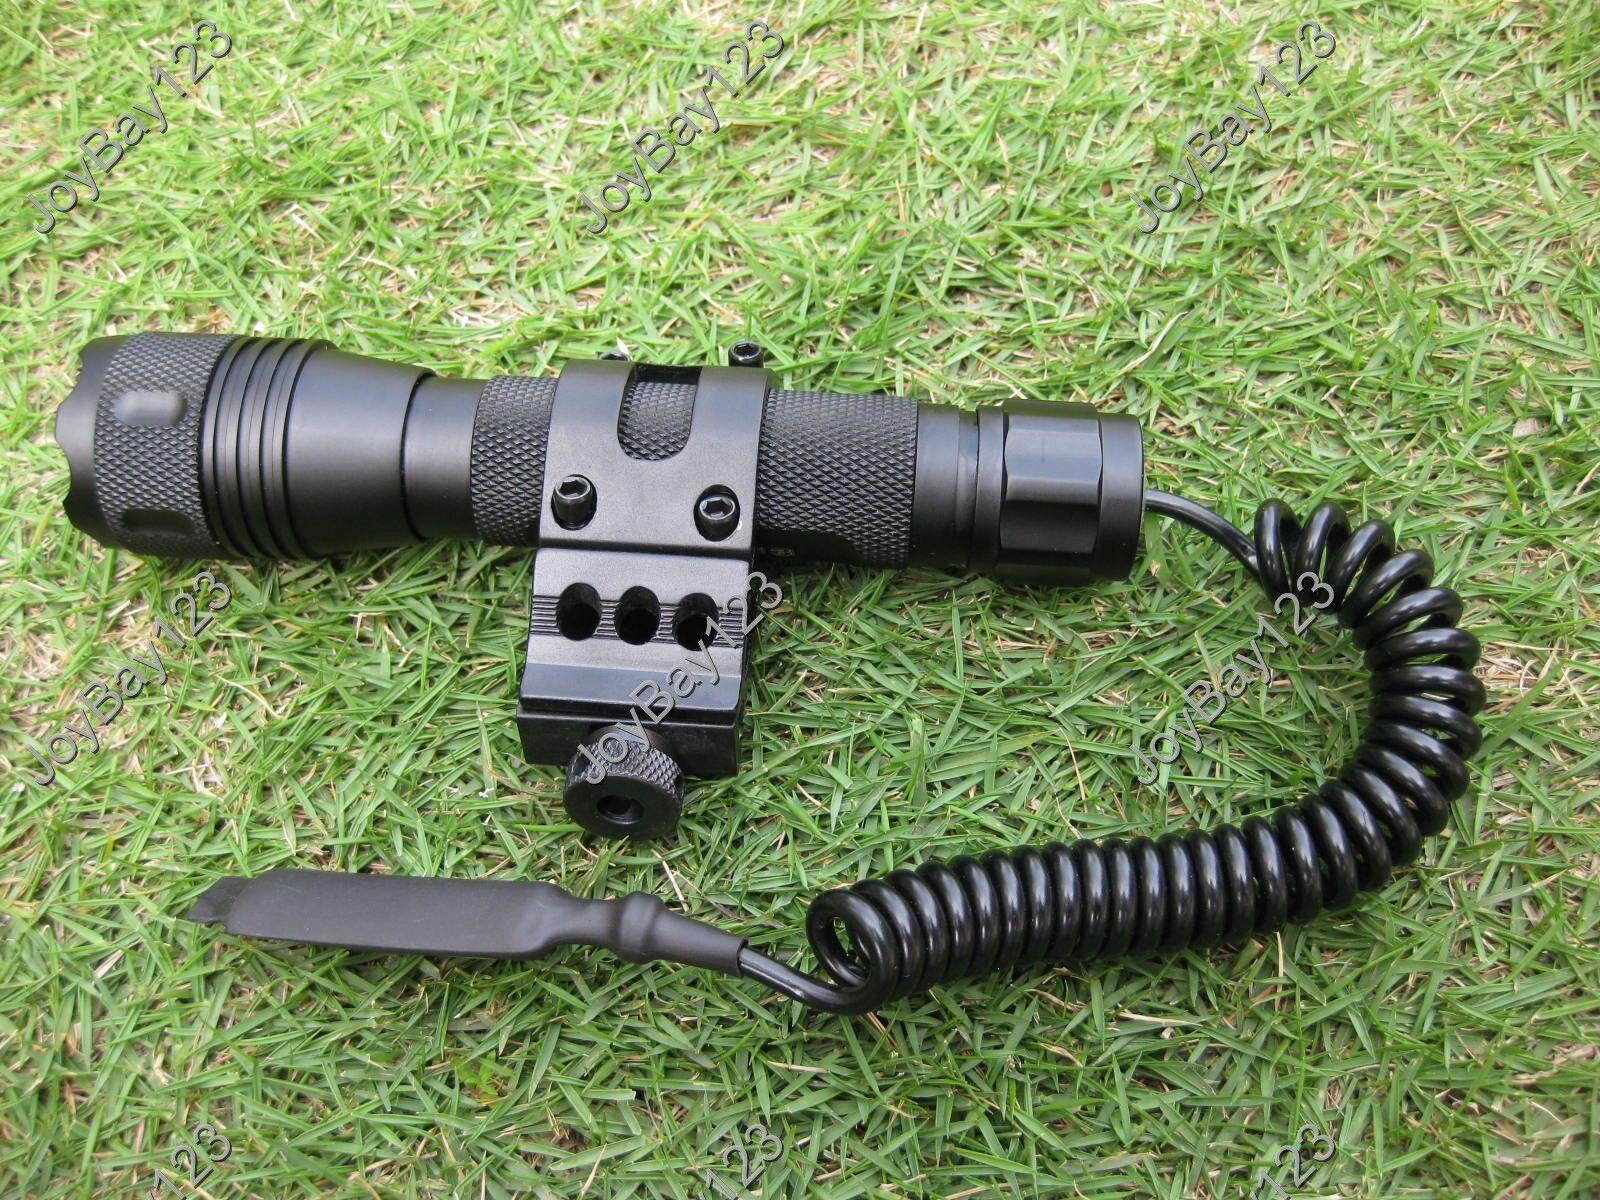 CREE T6 750 Lumens LED Flashlight & 20mm Picatinny Rail Mount Remote Switch Set